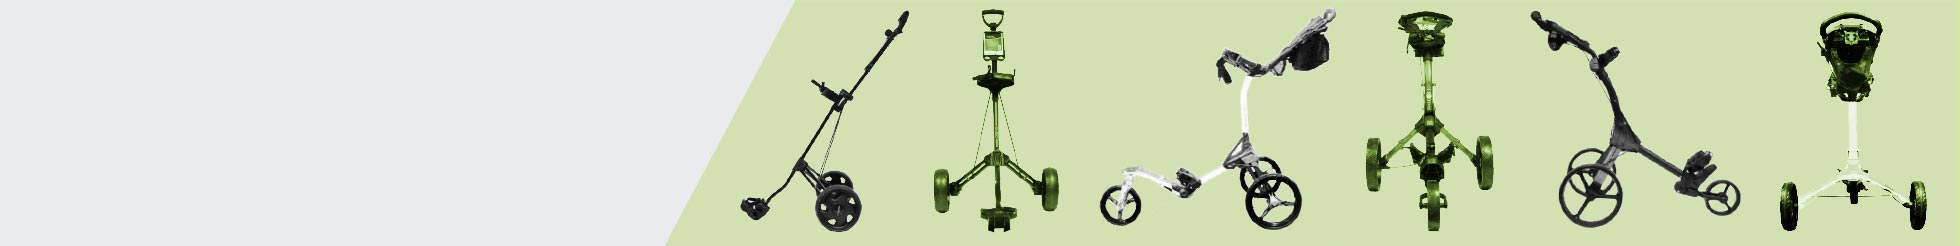 golf trolley g nstig kaufen golfl dchen. Black Bedroom Furniture Sets. Home Design Ideas